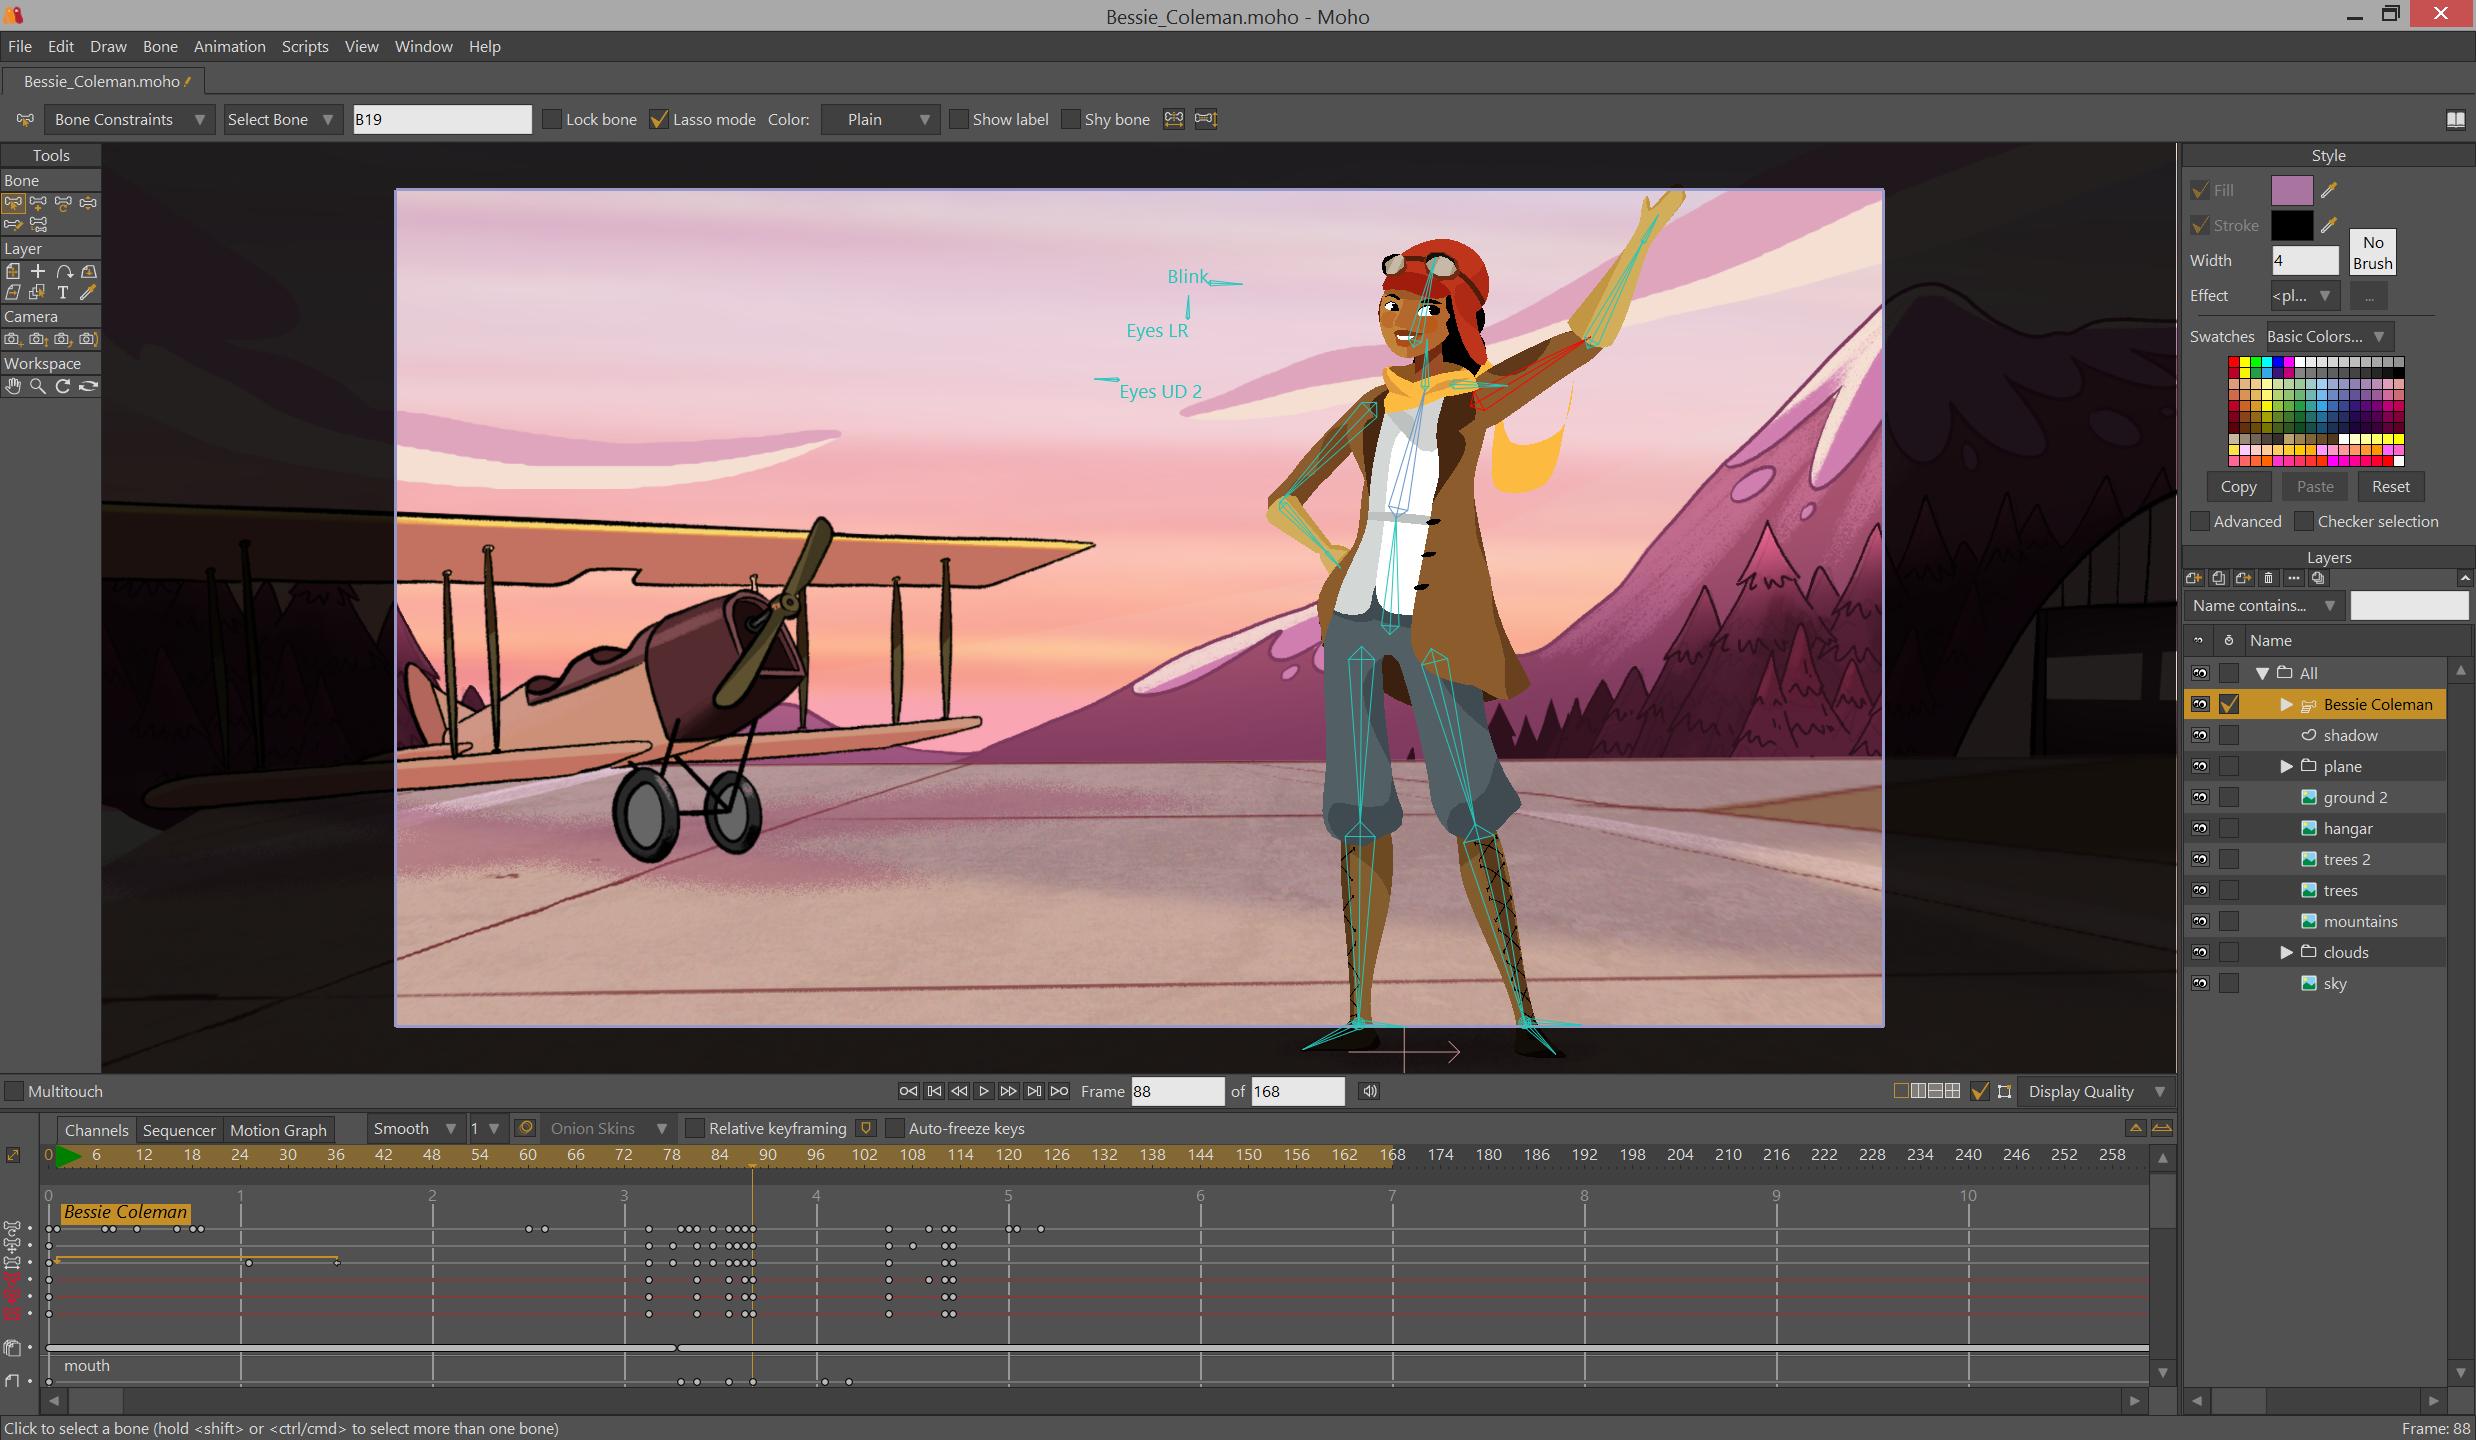 Amazon.com: Moho Pro 12 2D Animation Software Windows Download ...